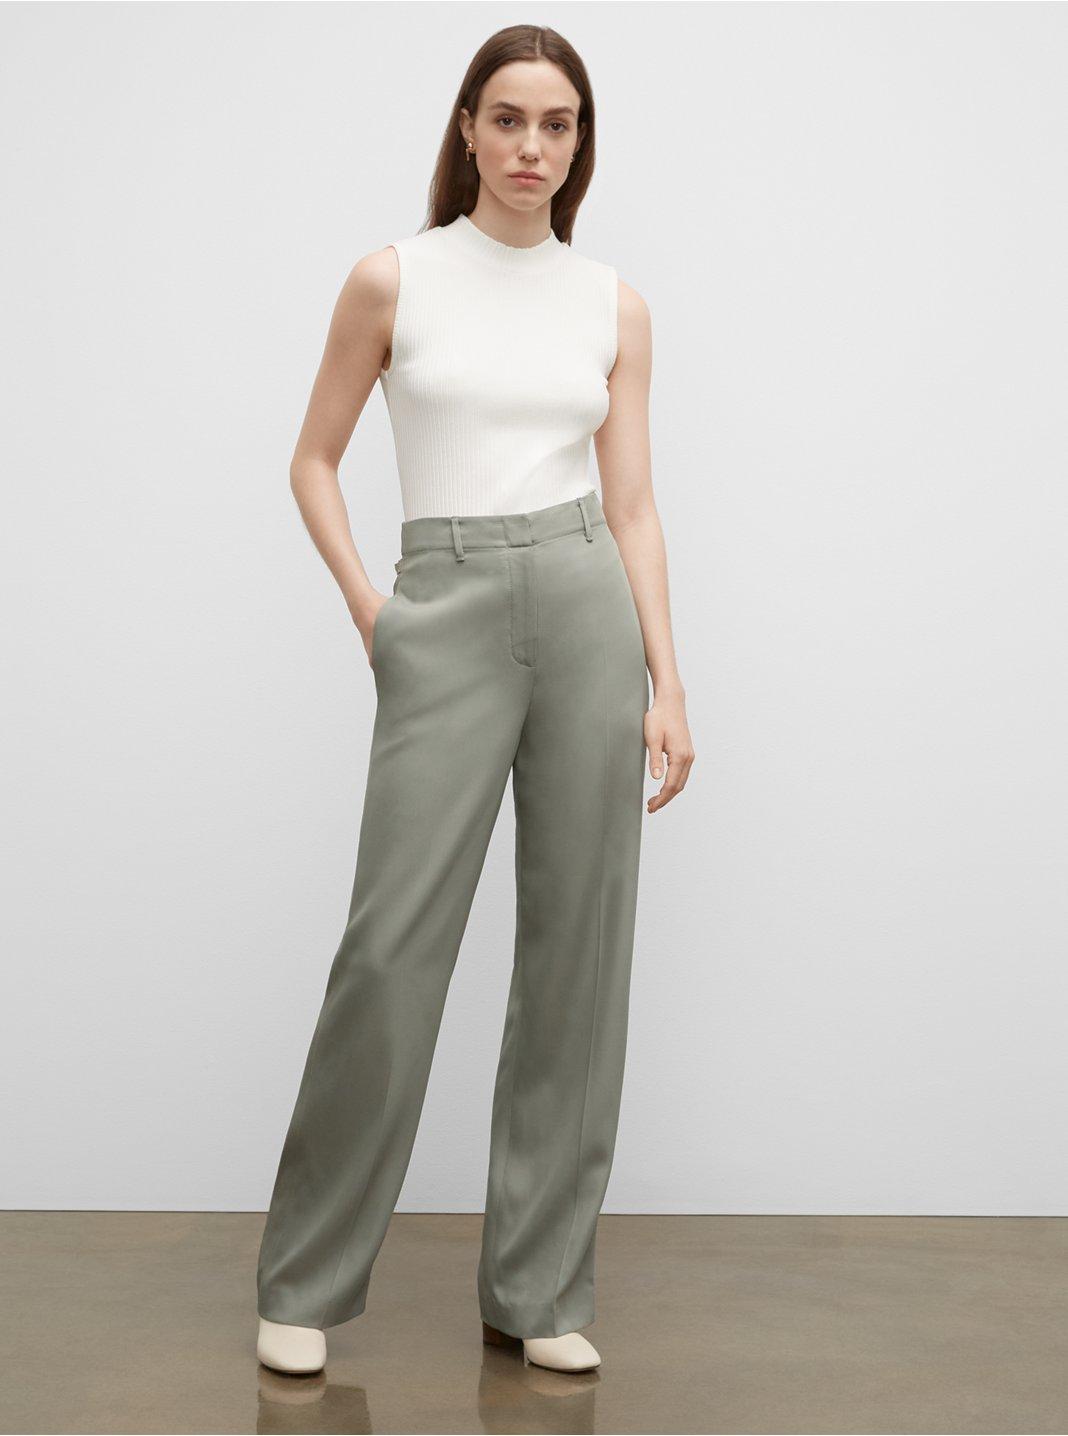 Tab Detail Pants